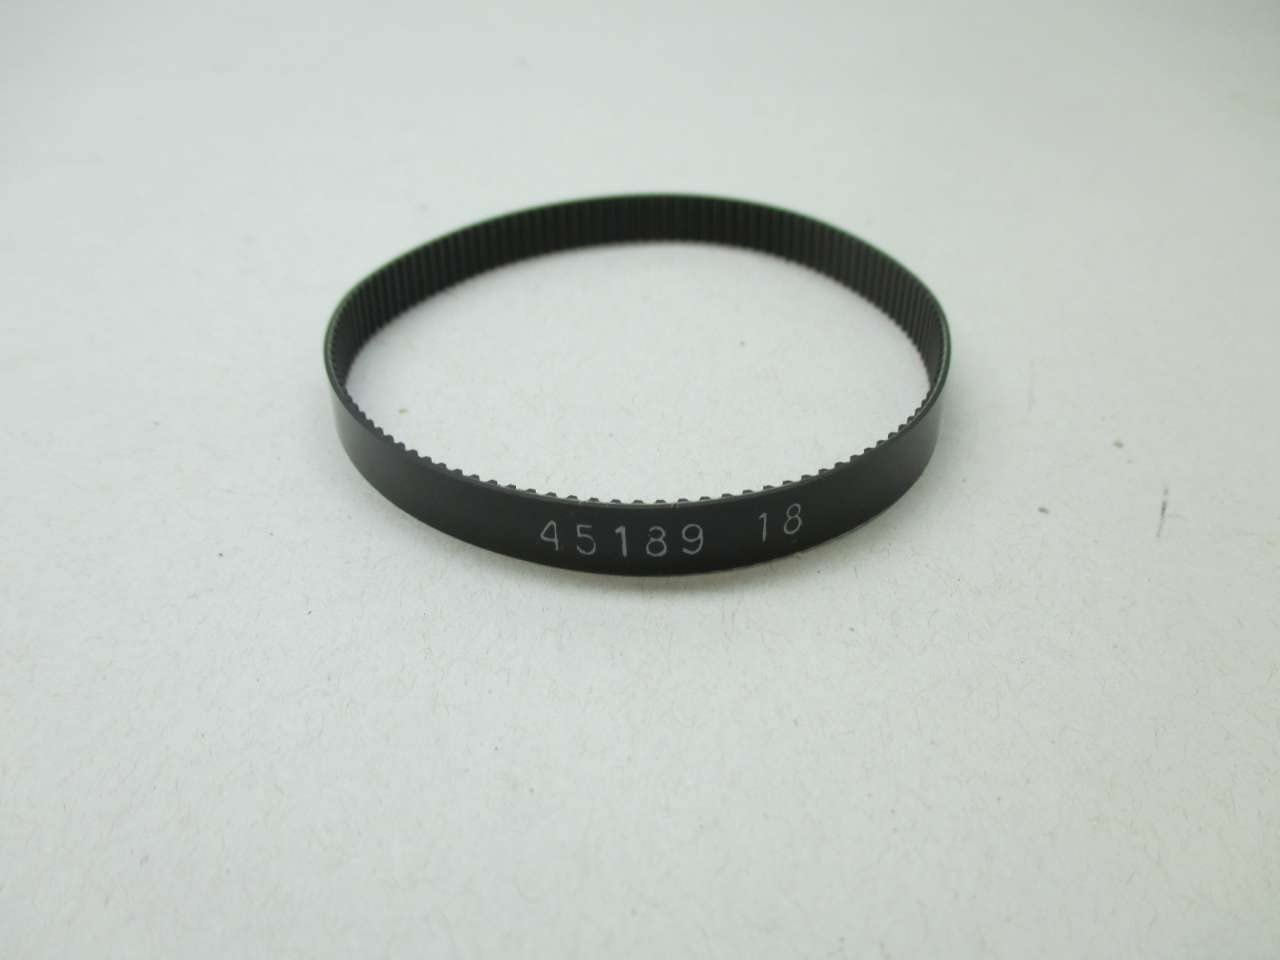 Zebra 45189-18 Printer Accessory